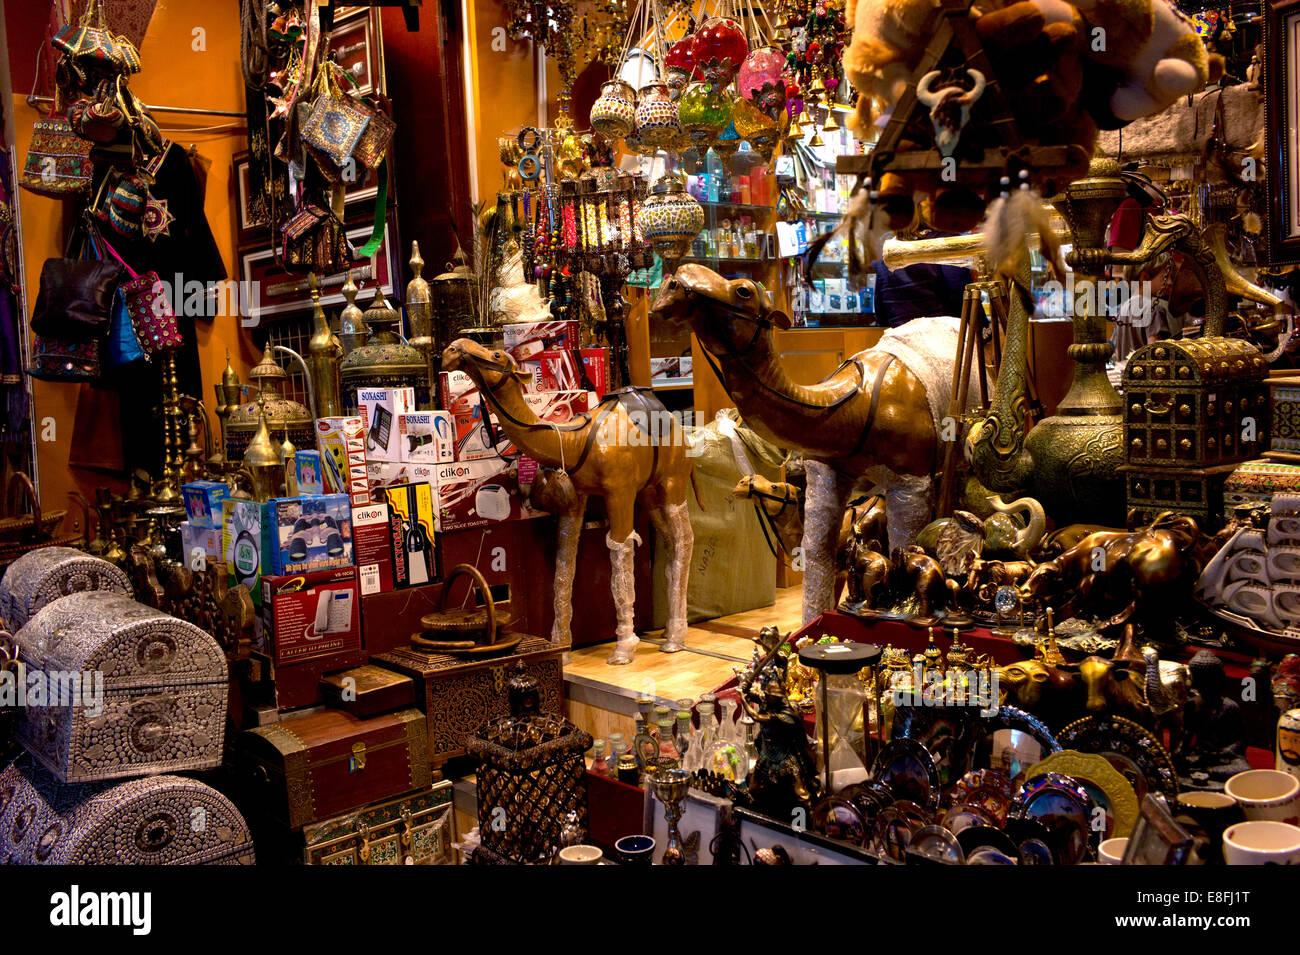 Oman, Muscat, bazar traditionnel souk Mutrah Photo Stock